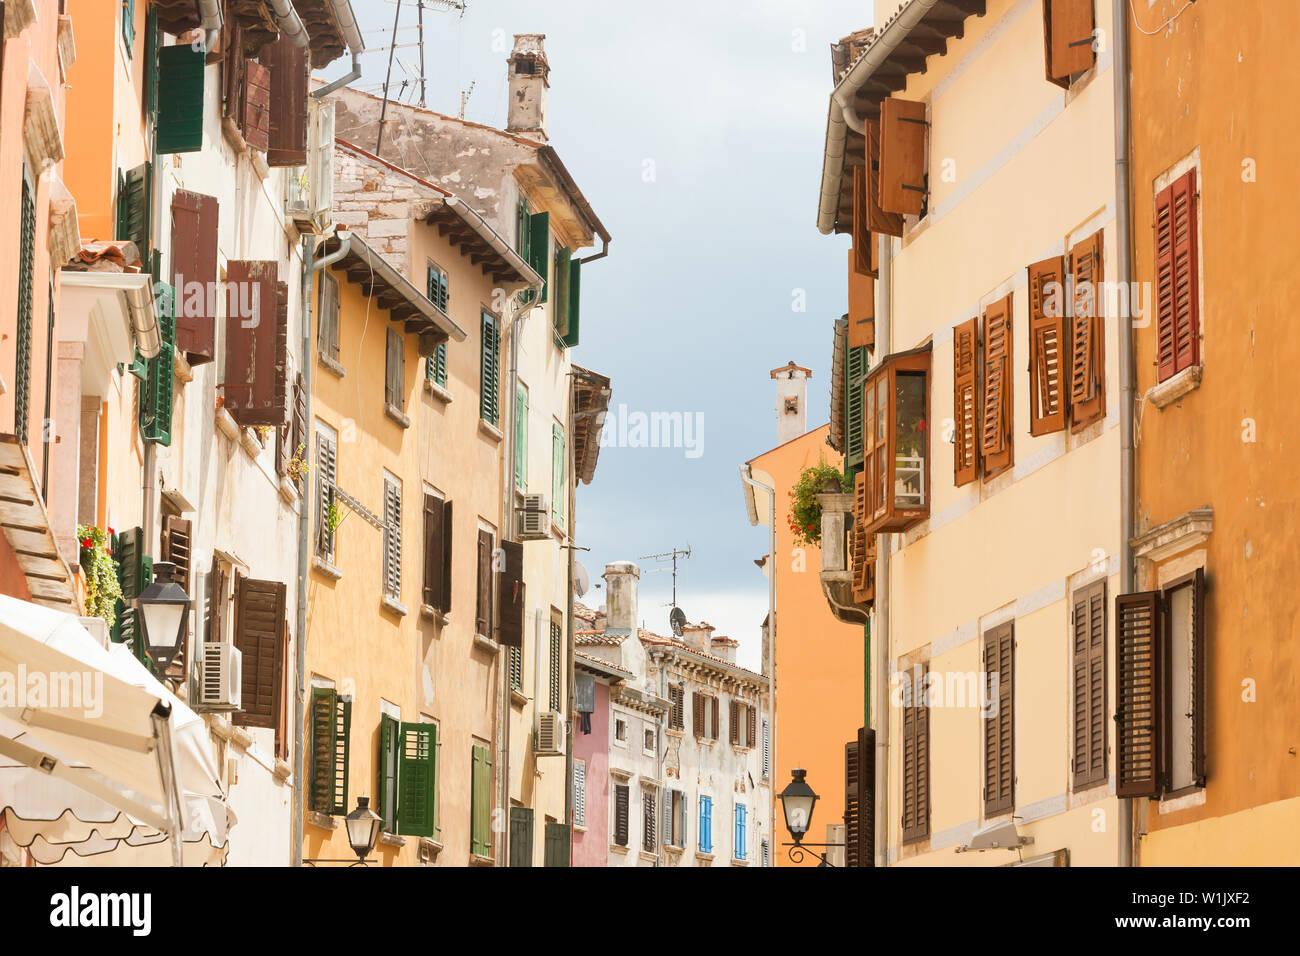 Rovinj, Istrien, Kroatien, Europa - Lebendige Geschichte in den Gassen von Rovinj Stockfoto